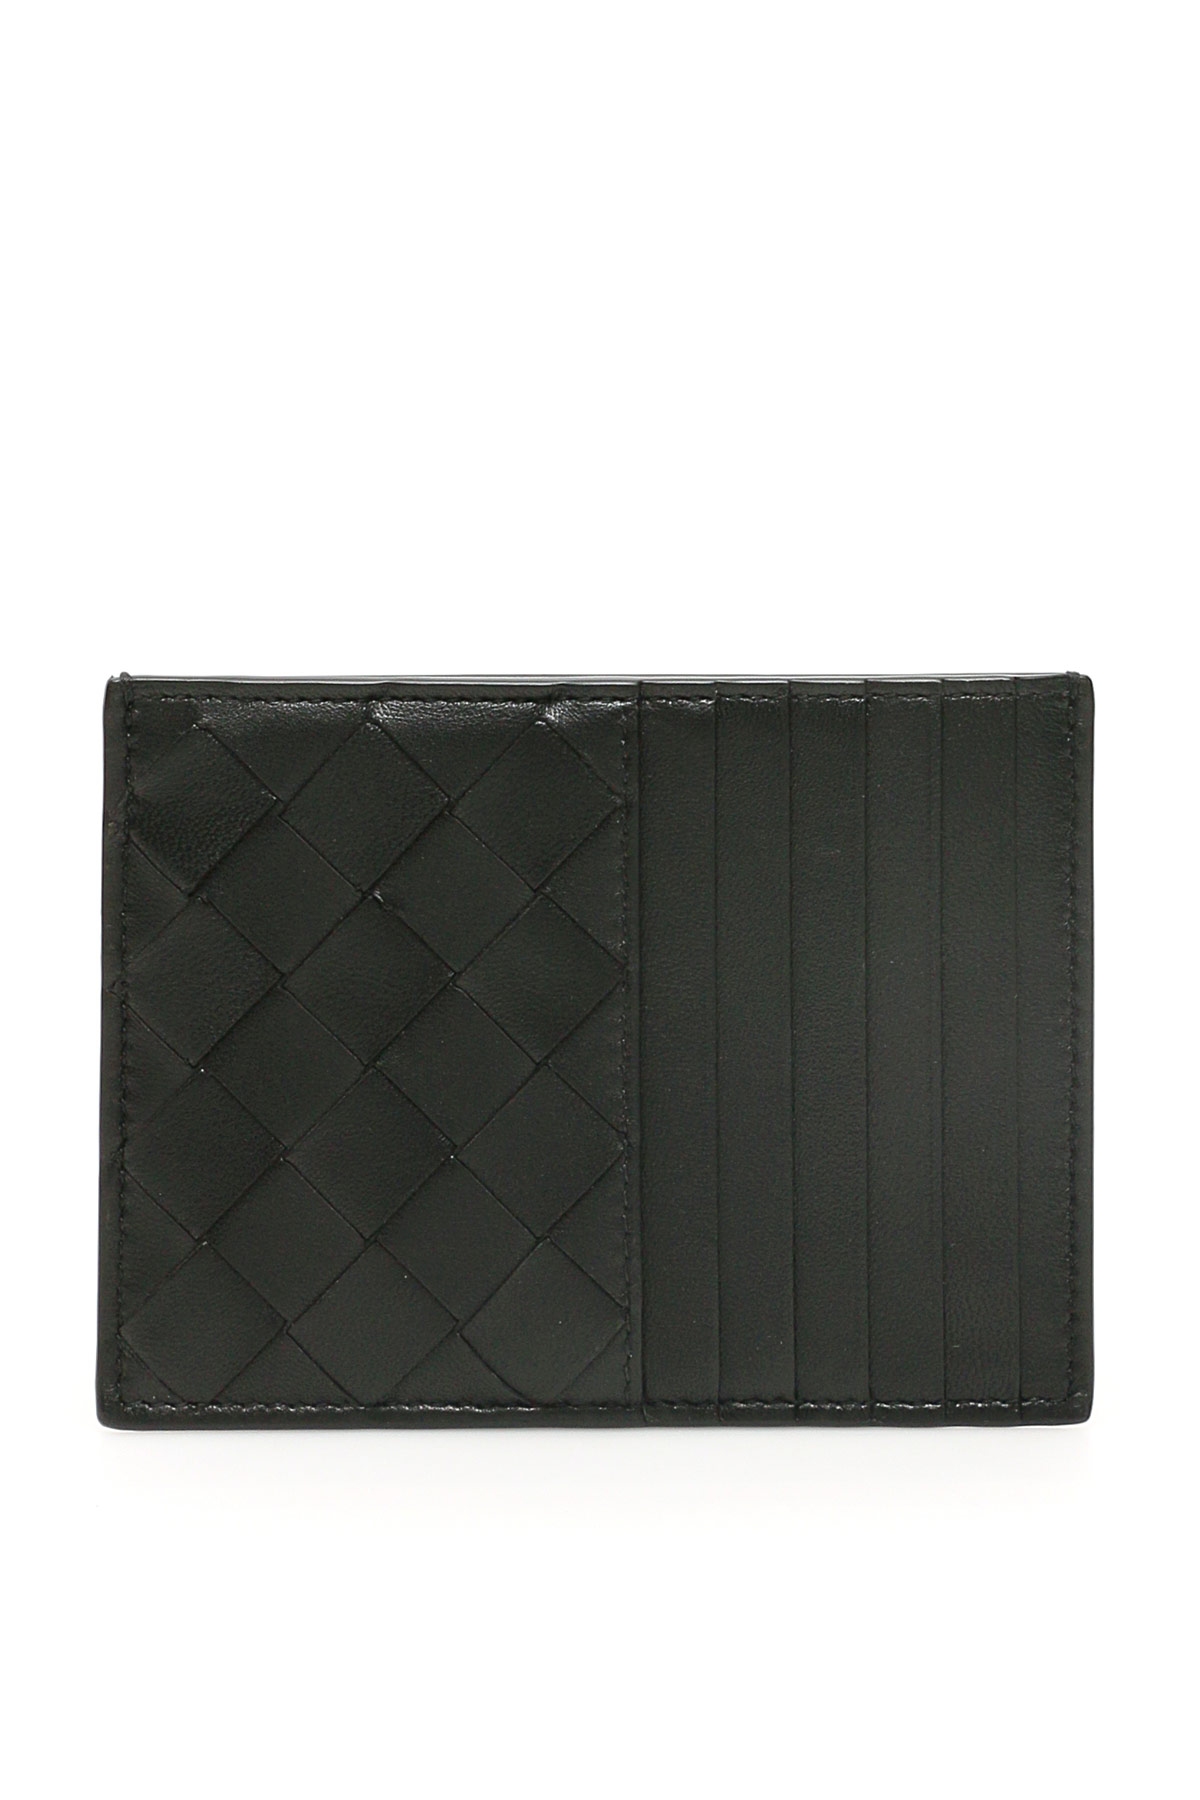 BOTTEGA VENETA UNISEX INTRECCIATO 15 CARDHOLDER OS Black Leather